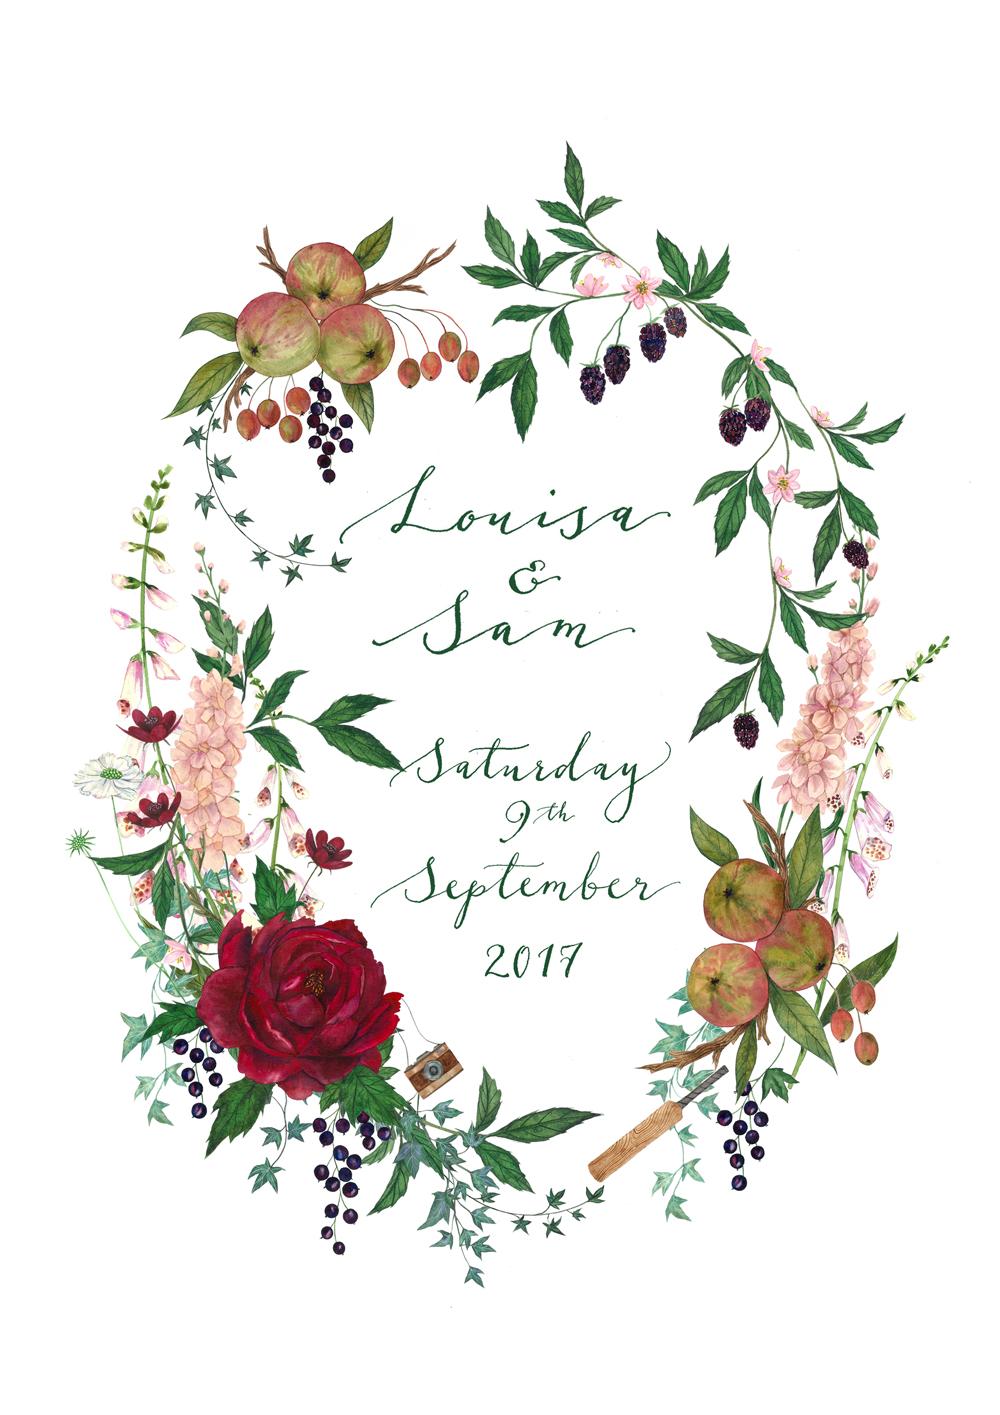 Louisa-Wreath-Callig.jpg